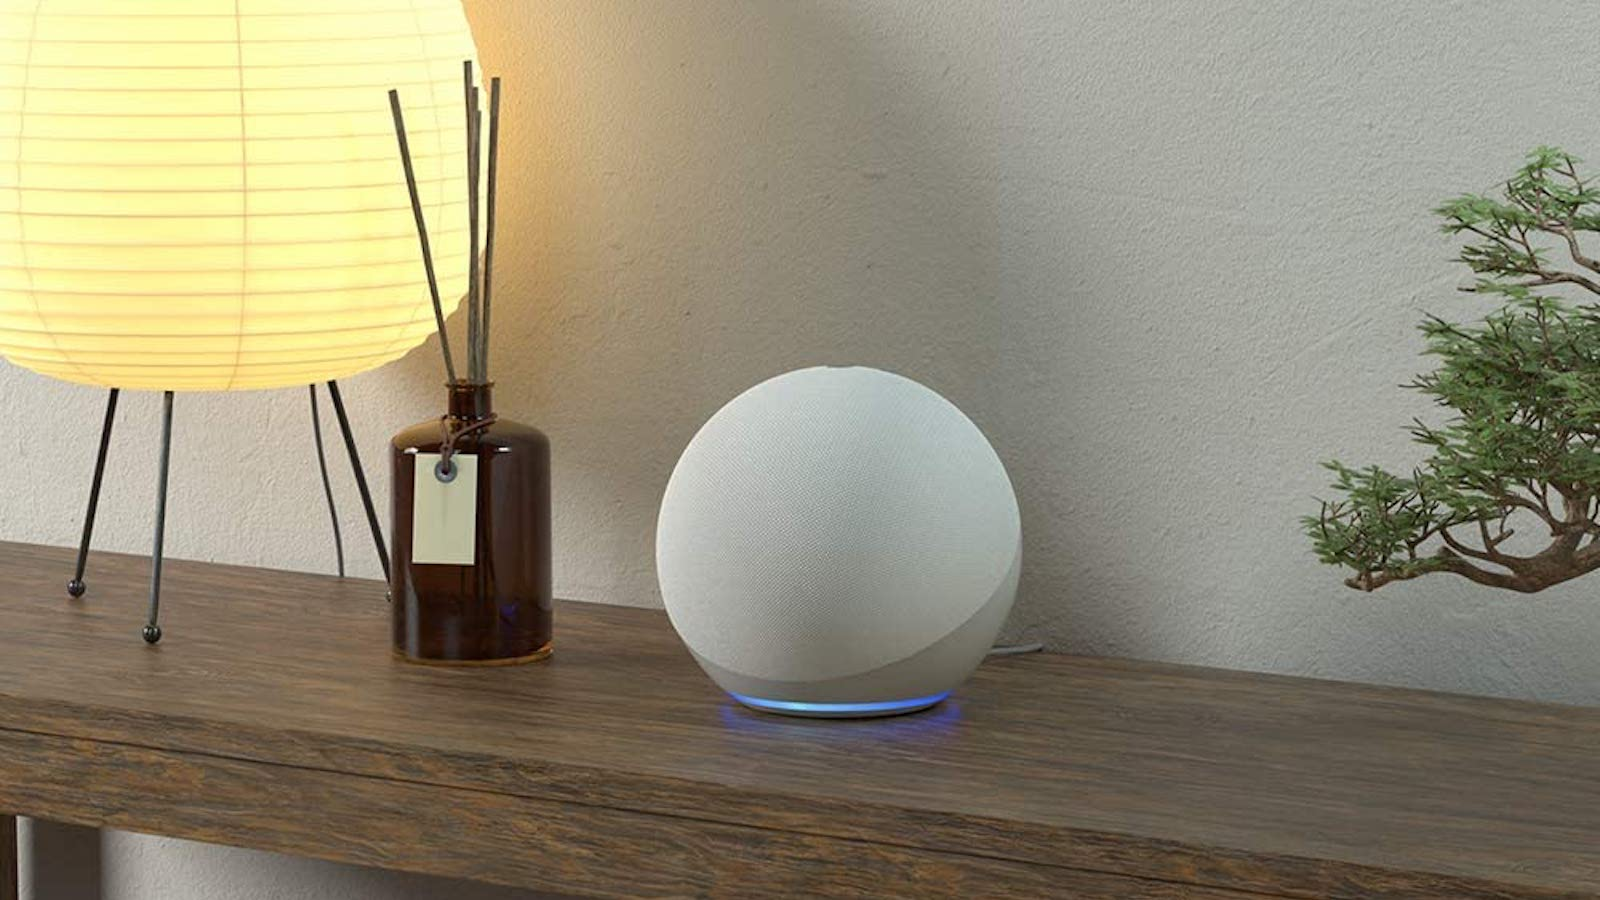 New Amazon Echo 4th-generation smart speaker comes in a spherical shape